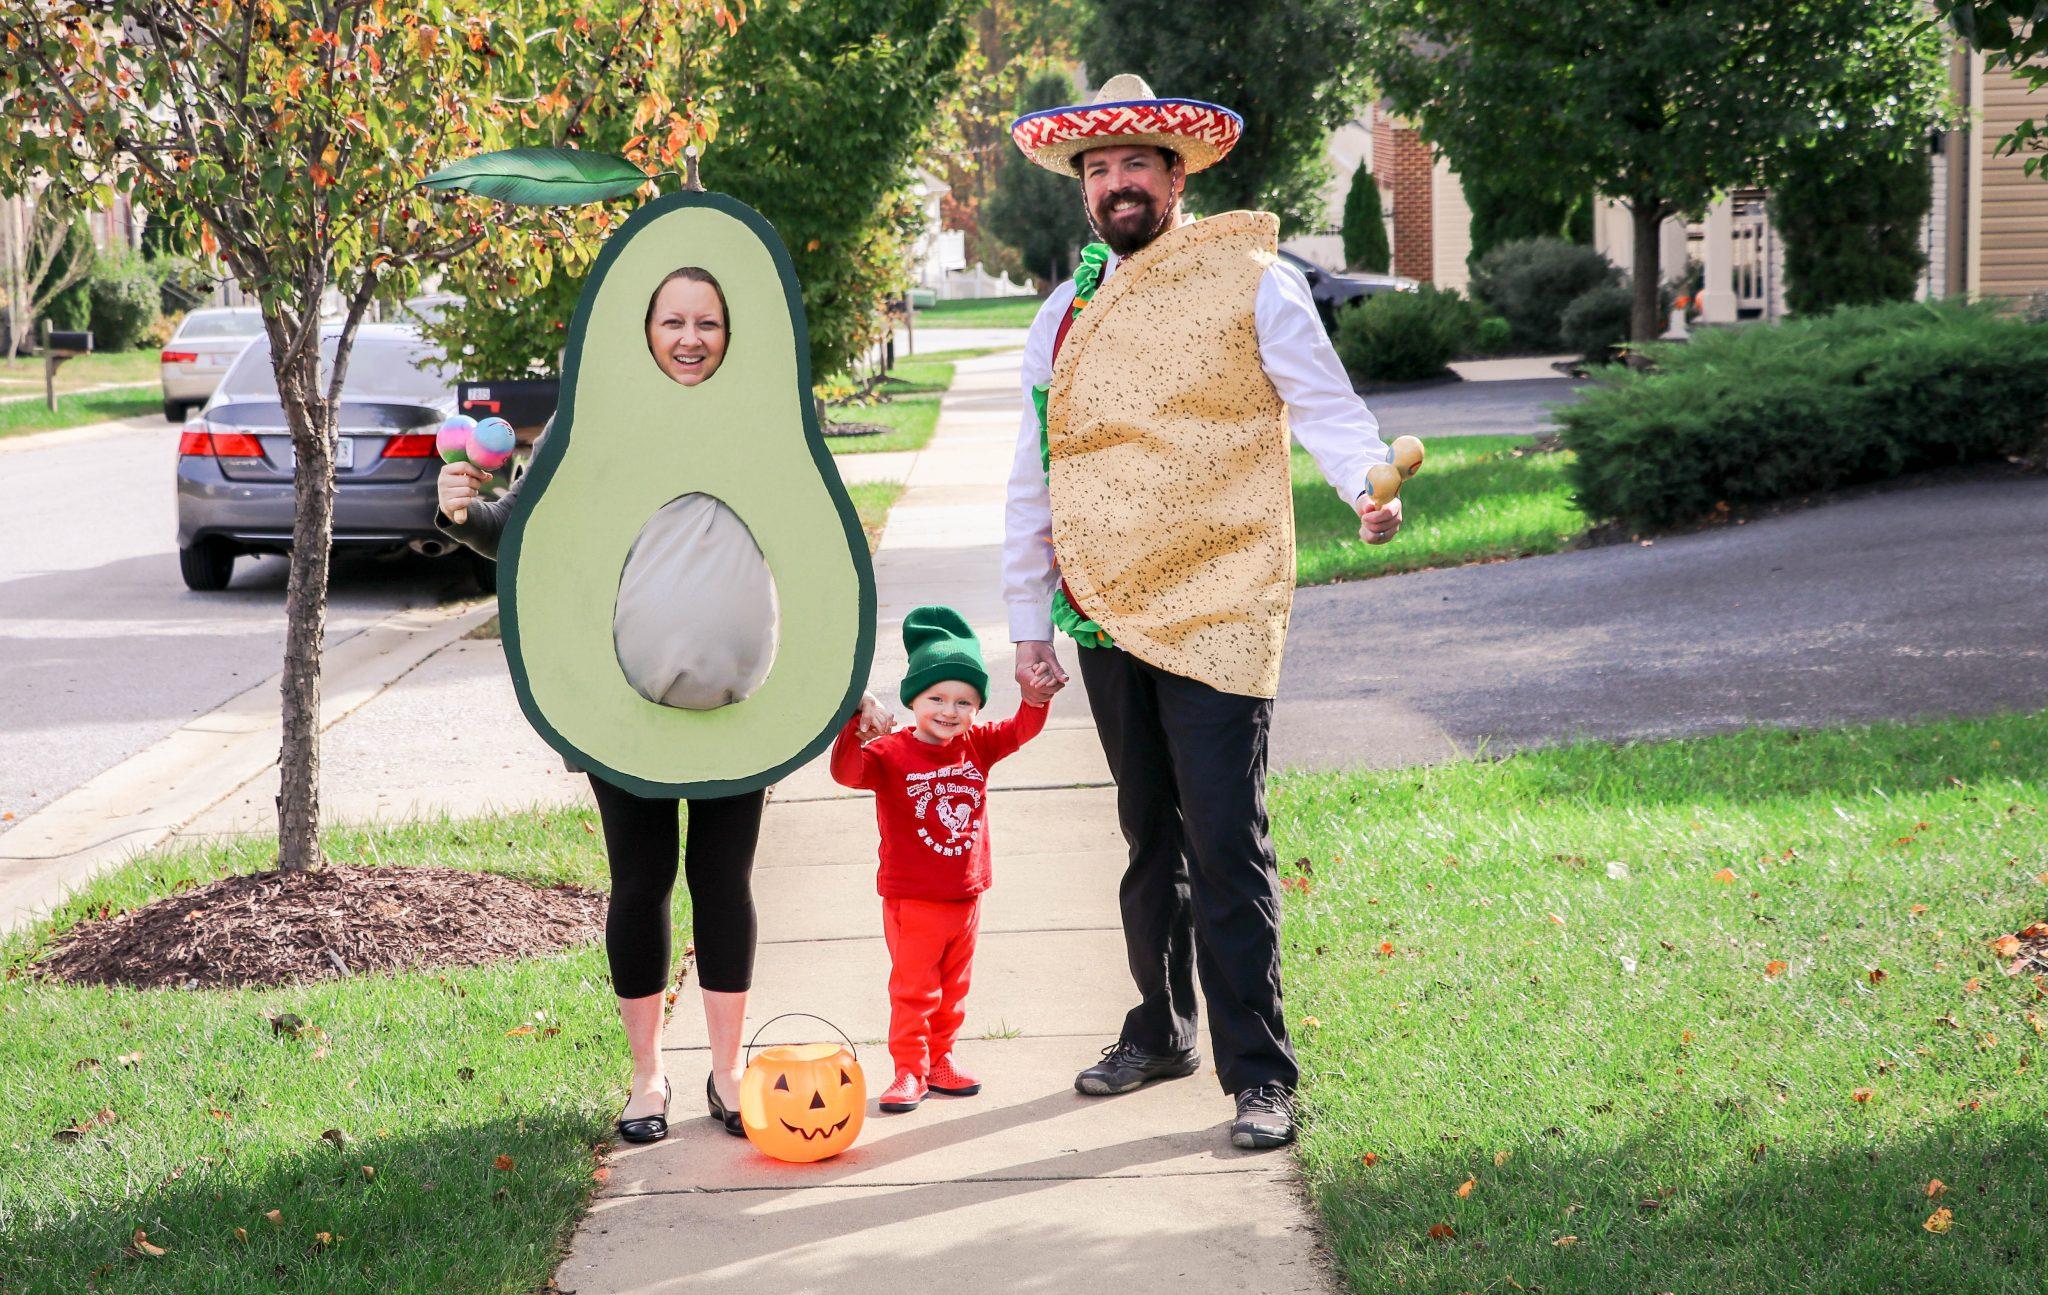 Diy avocado maternity halloween costume saving amy avocado maternity halloween costume solutioingenieria Image collections